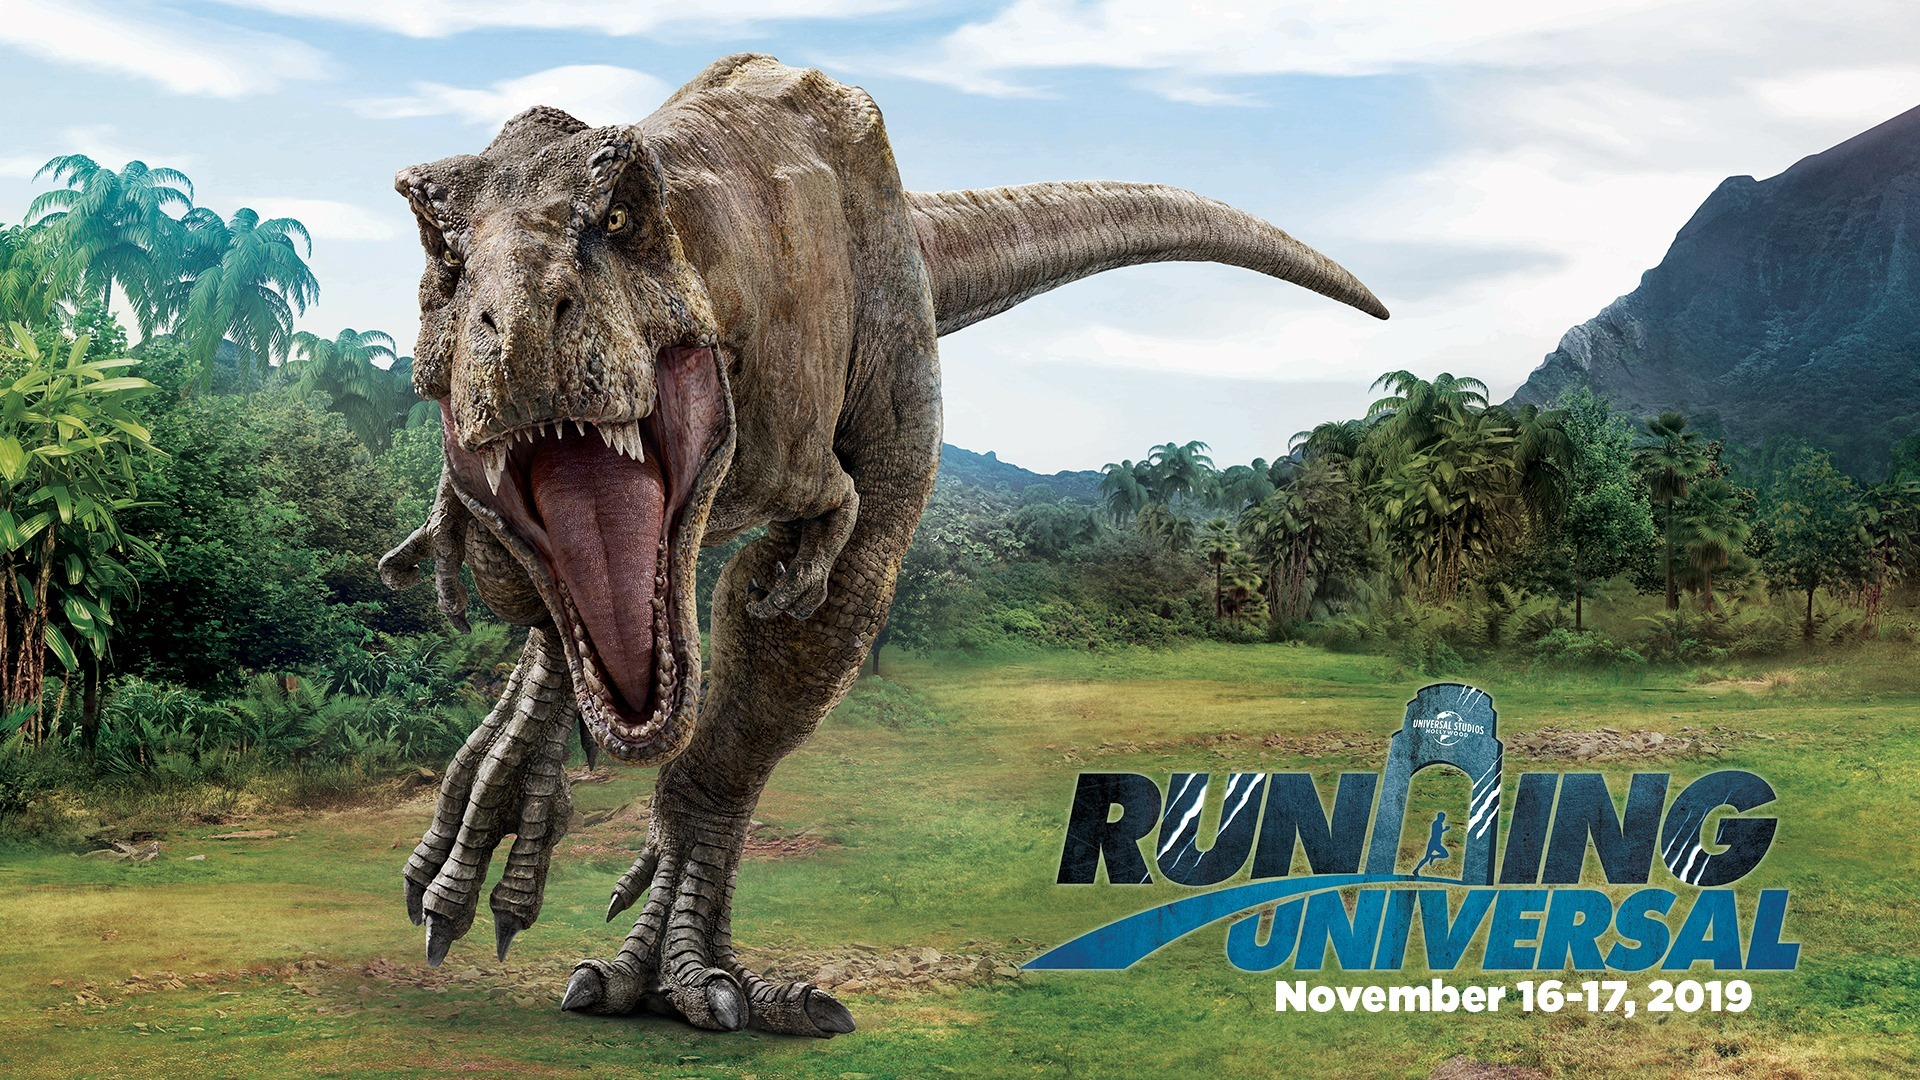 Running Universal featuring Jurassic World